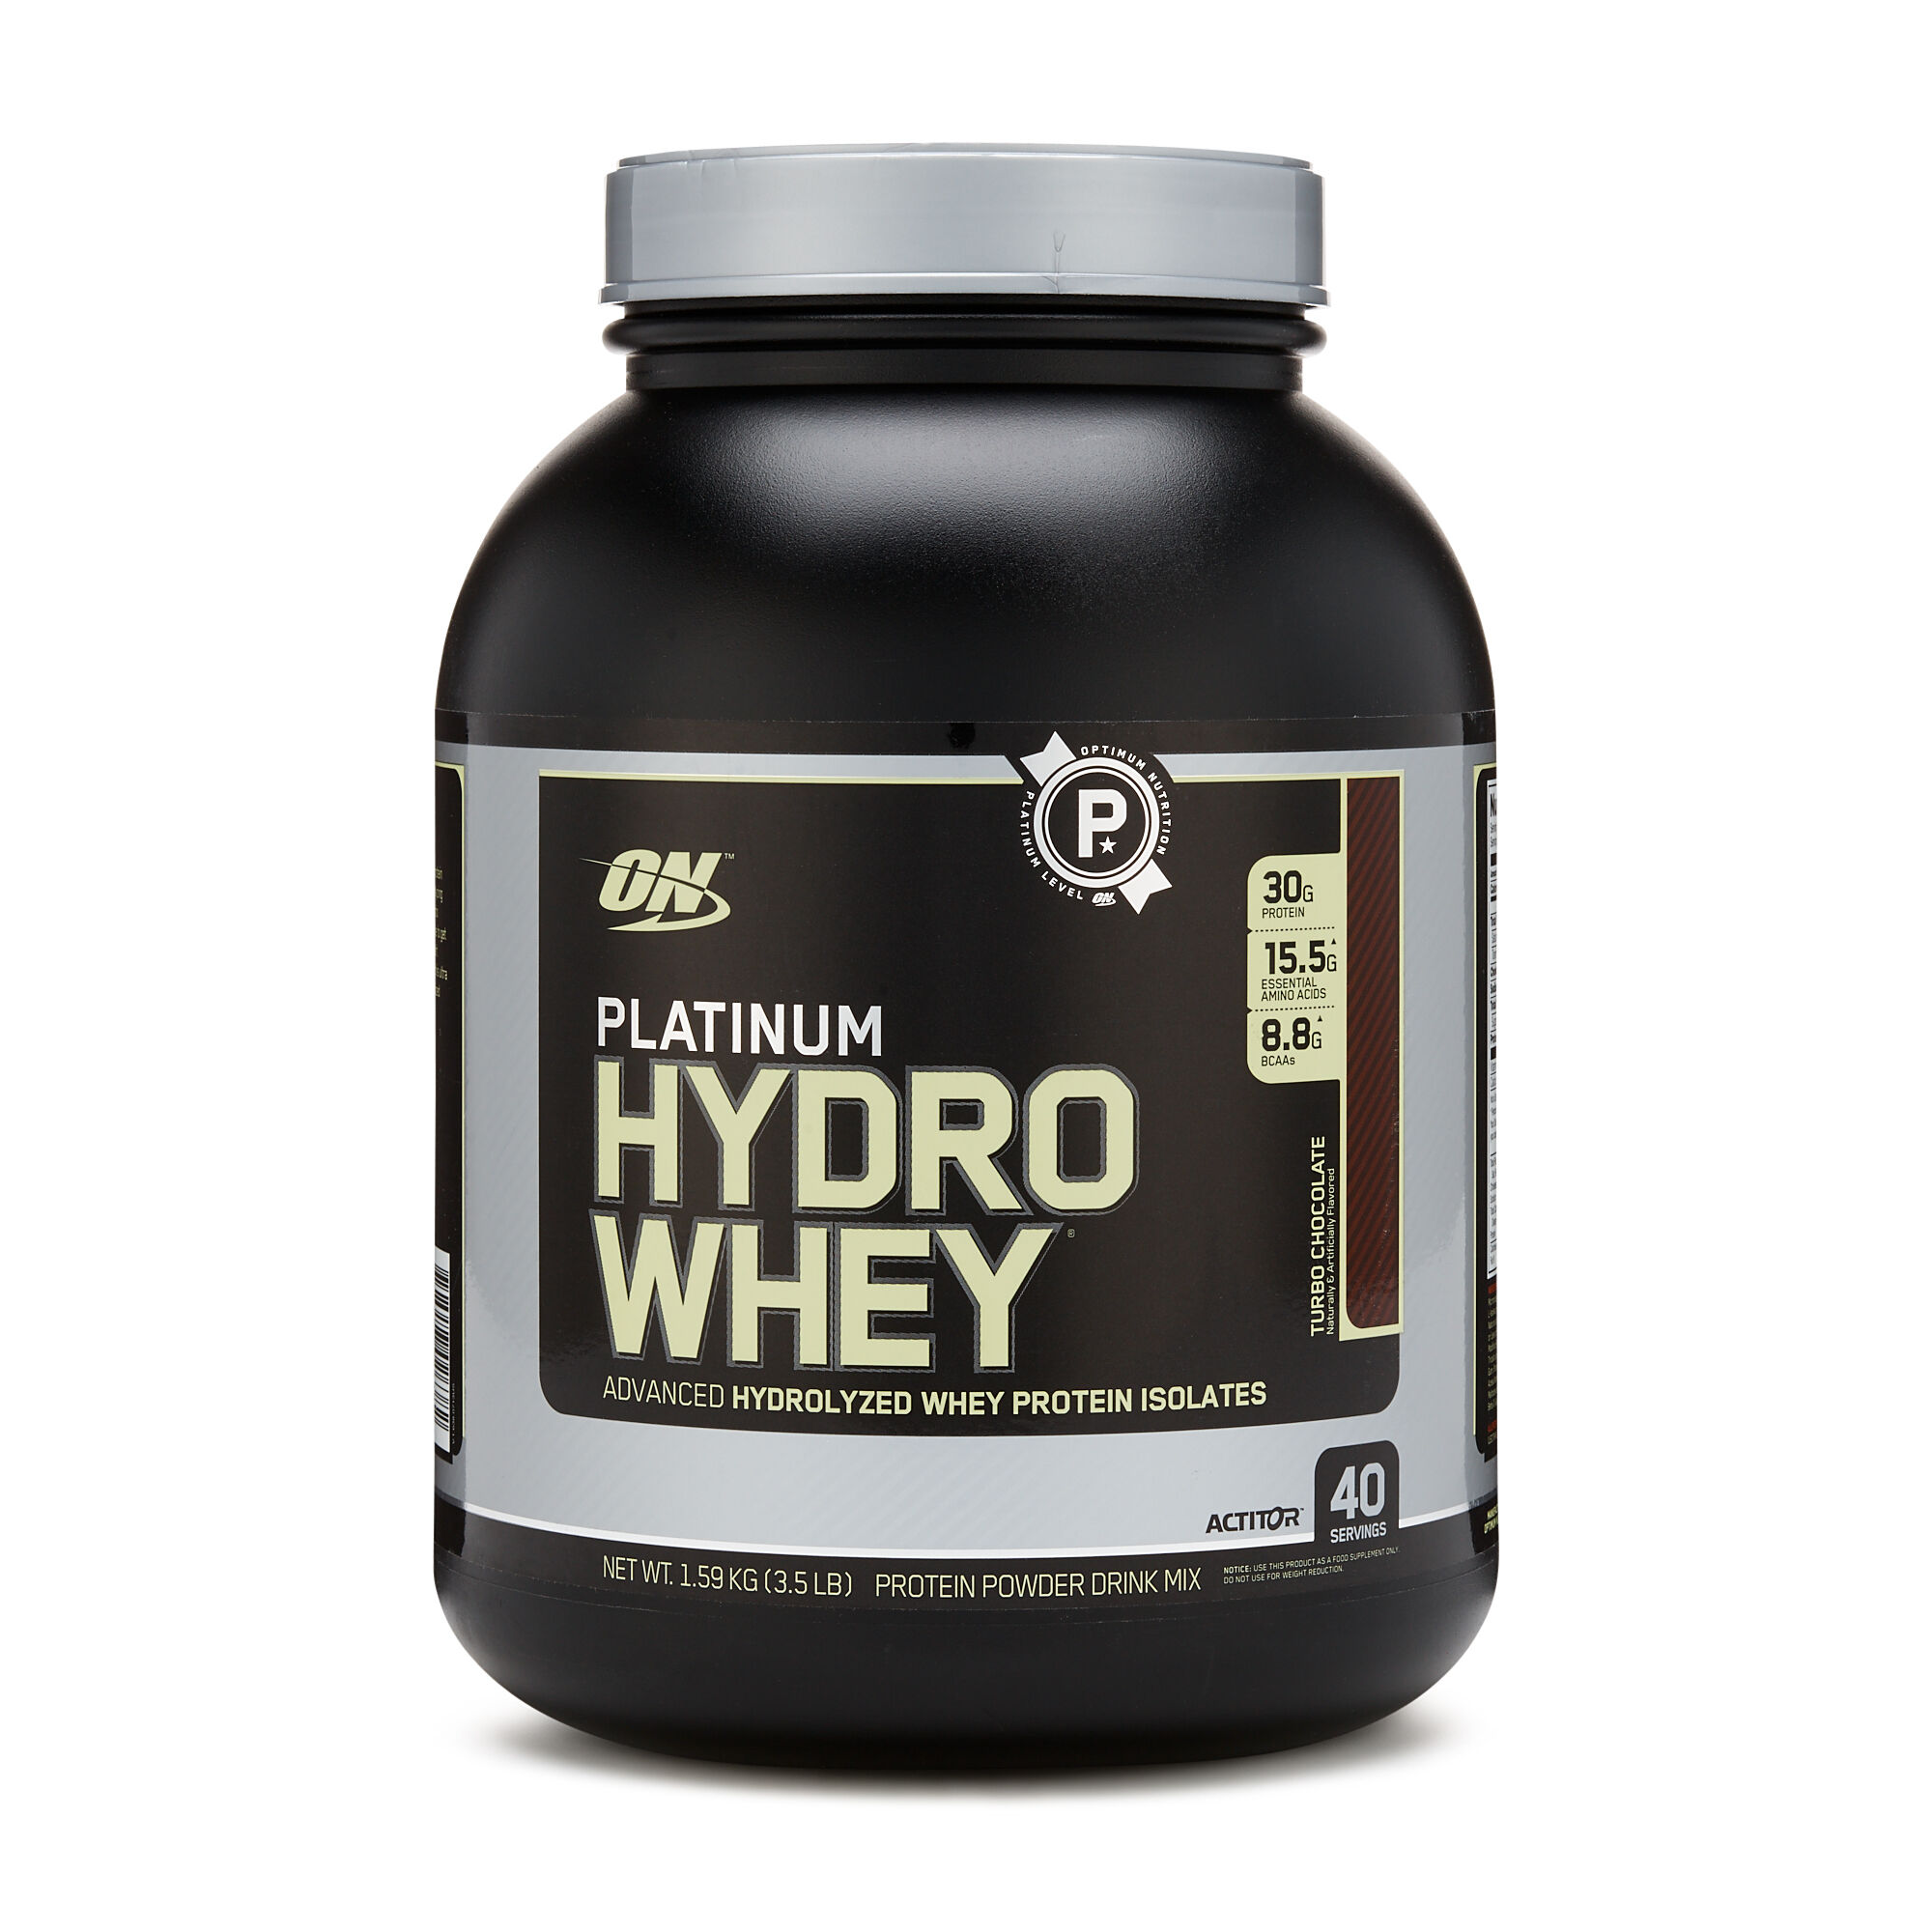 On platinum hydro whey protein